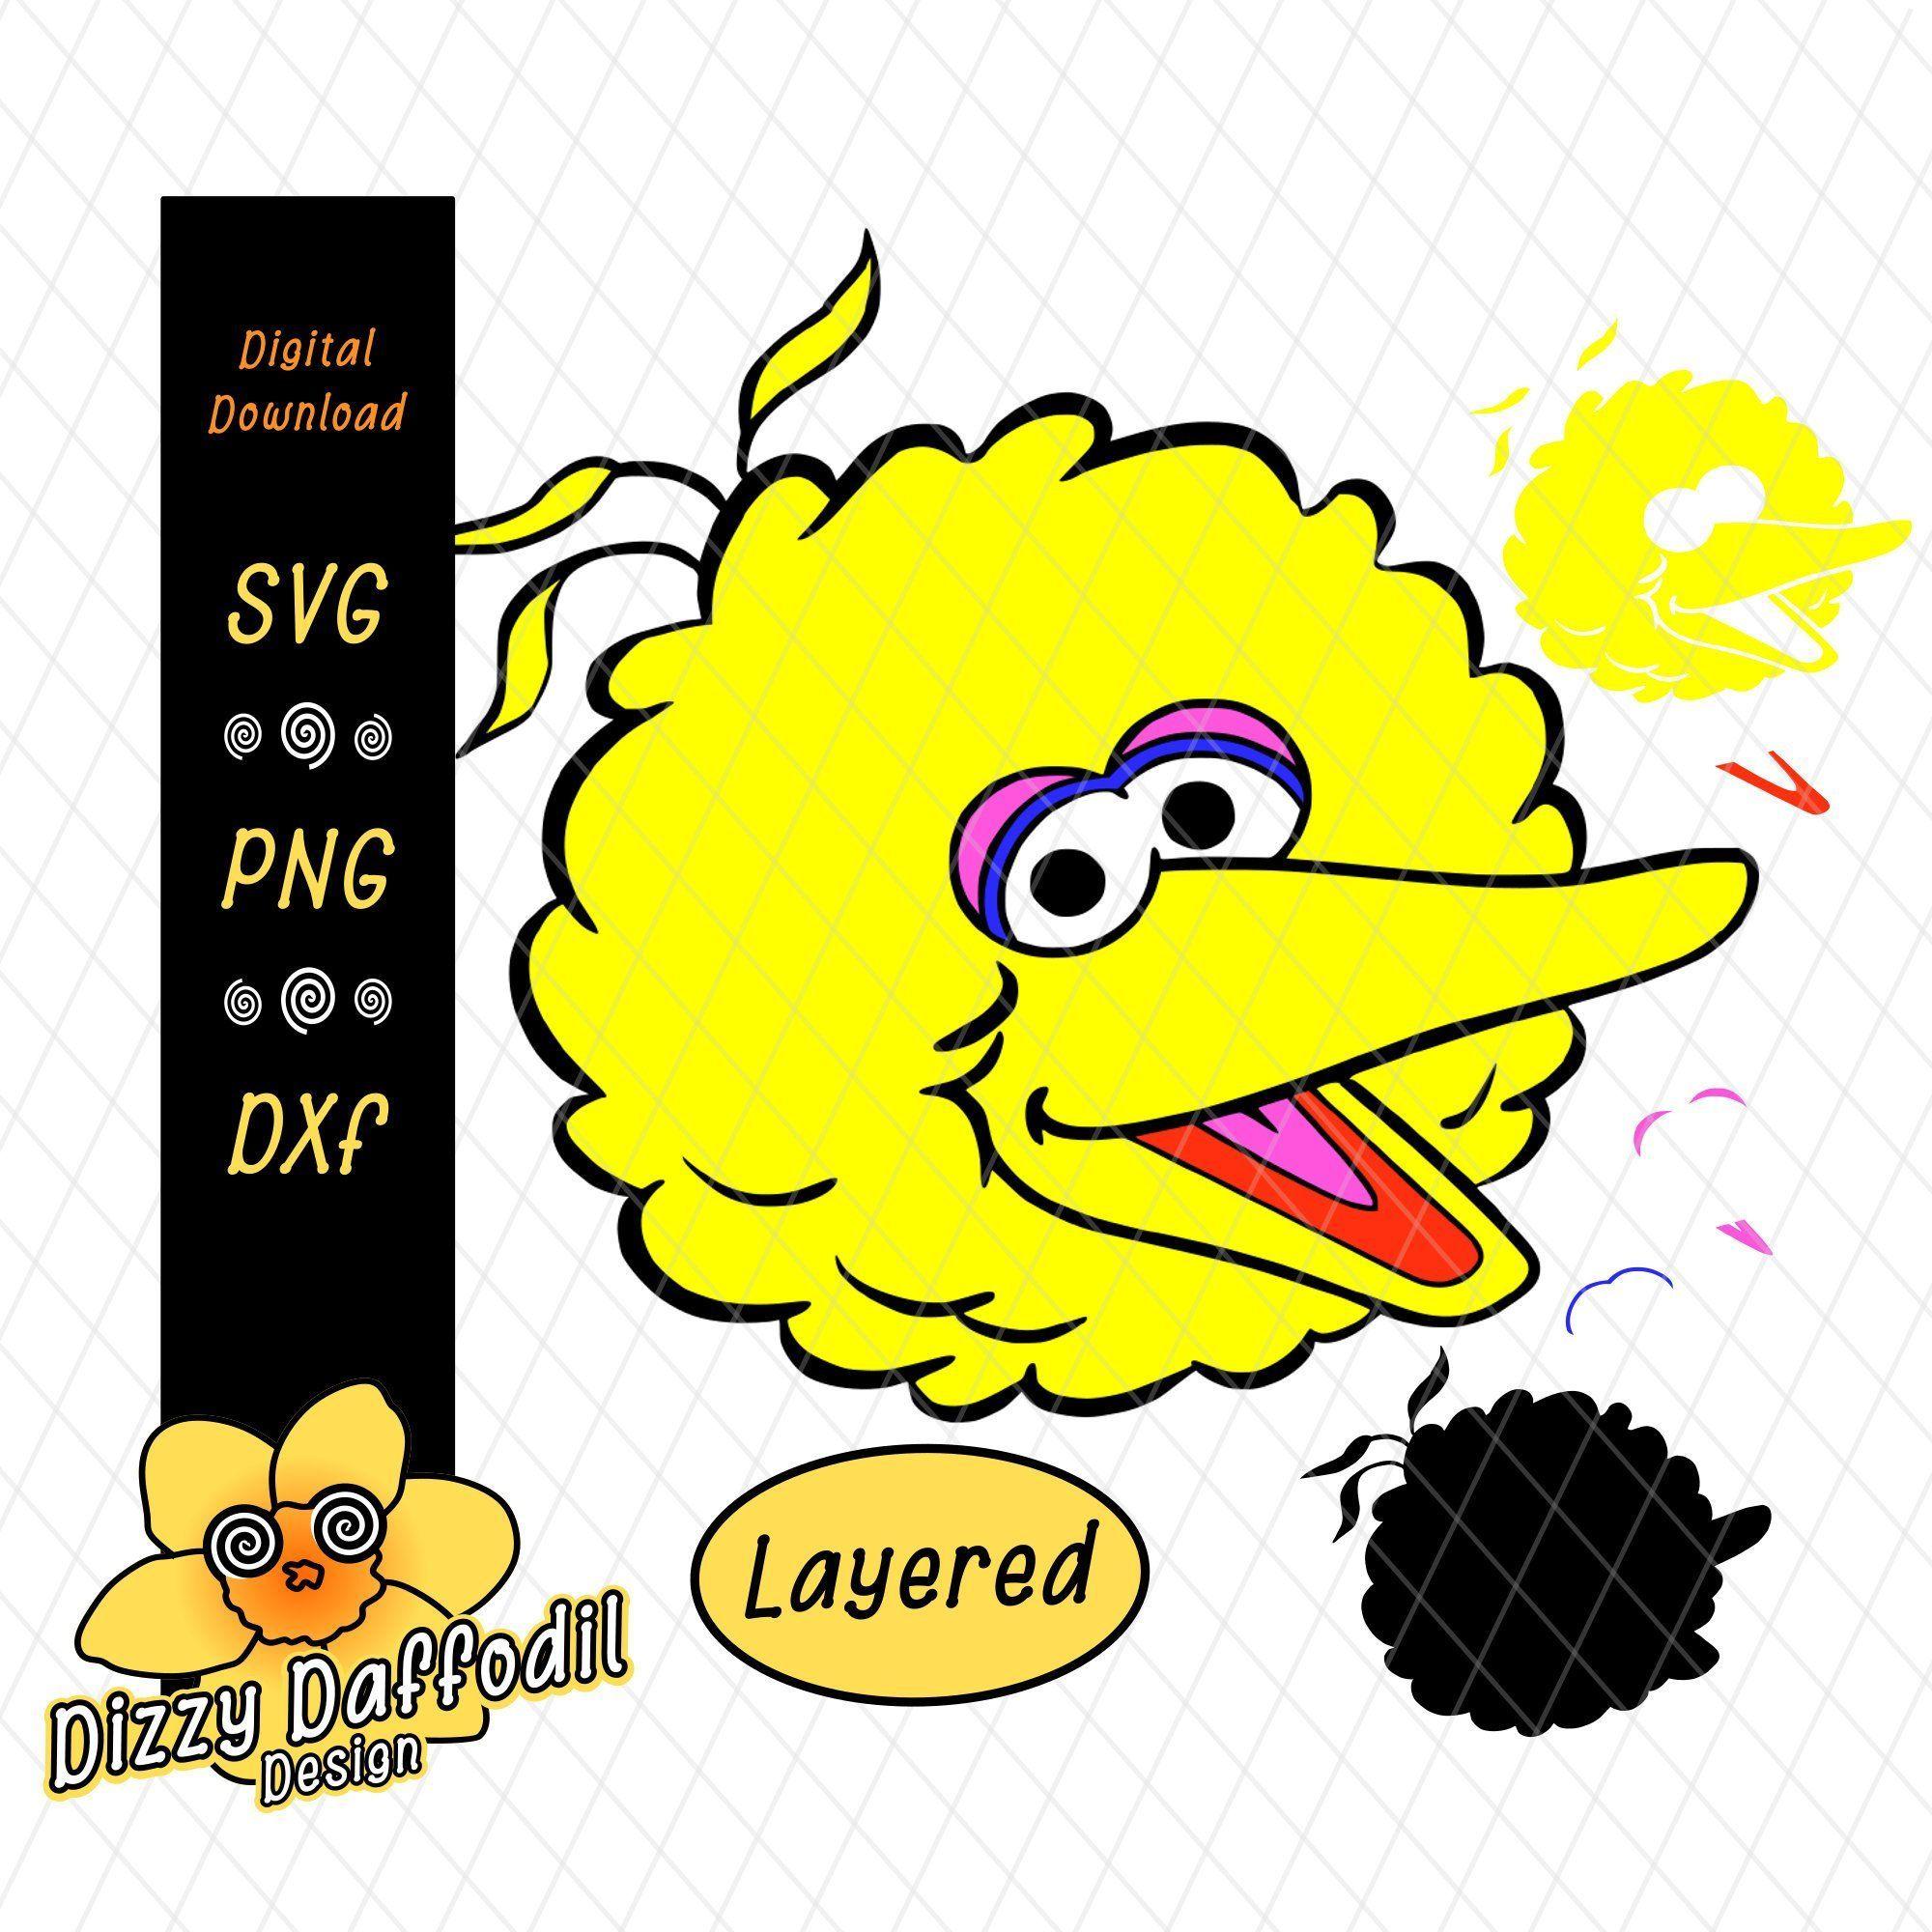 Big Bird Face Head Svg Dxf Sesame Street Digital Download For Birthday Card Or Birthday Invitation By Dizzydaffodildesig Big Bird Birthday Cards Sesame Street